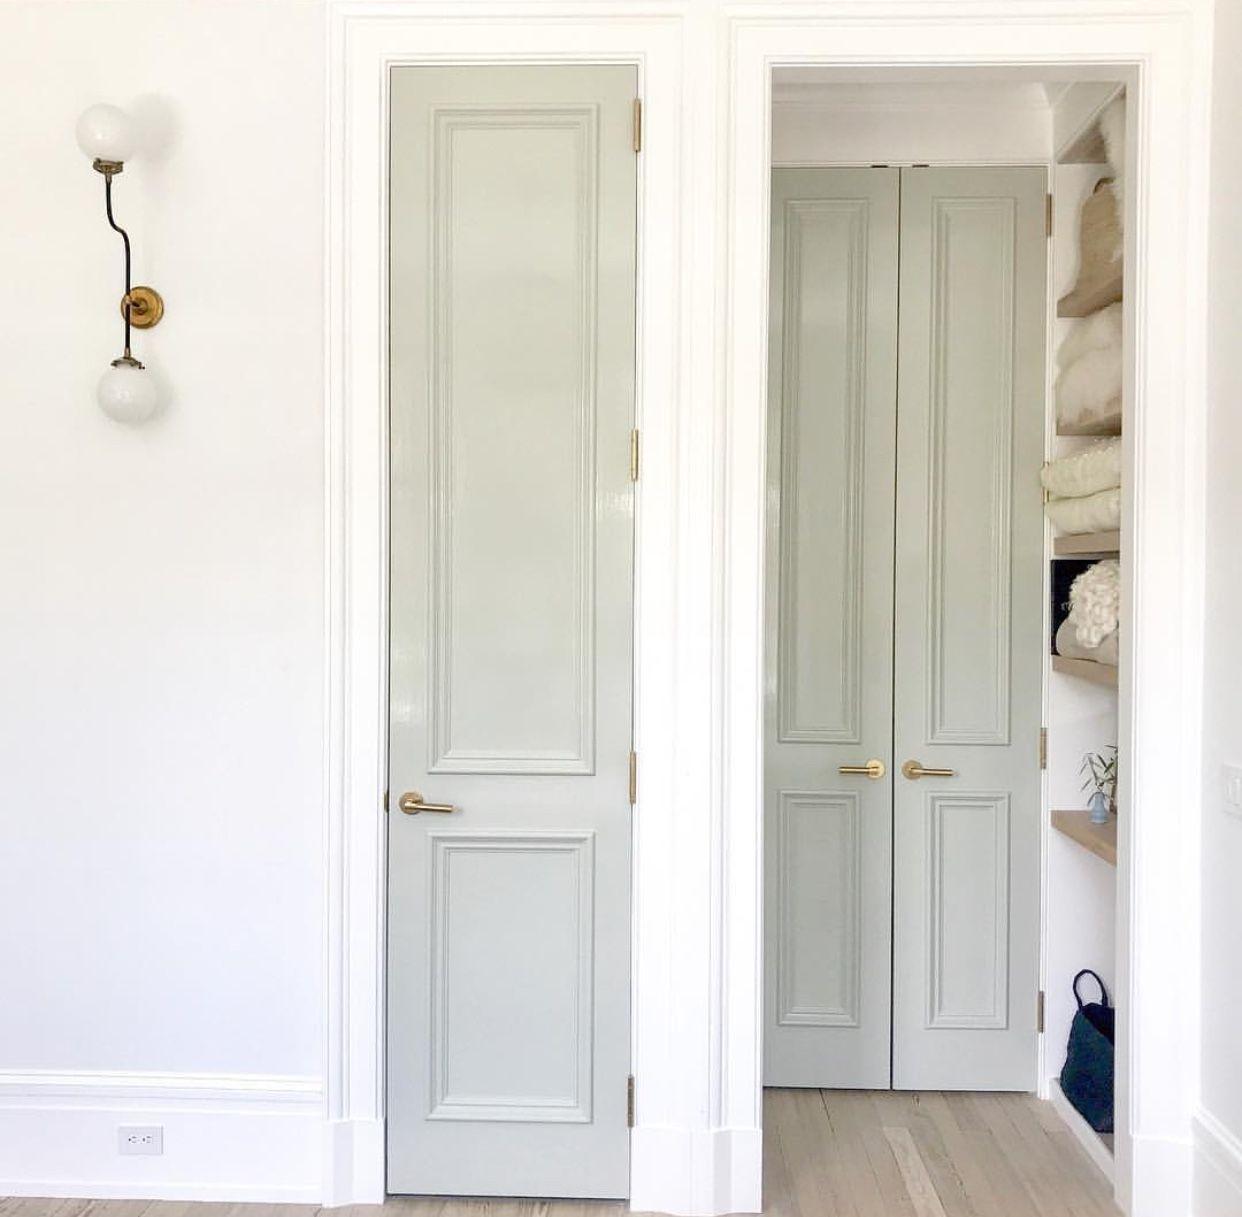 Doors Are Painted In Farrow Ball Mizzle Row House Narrow